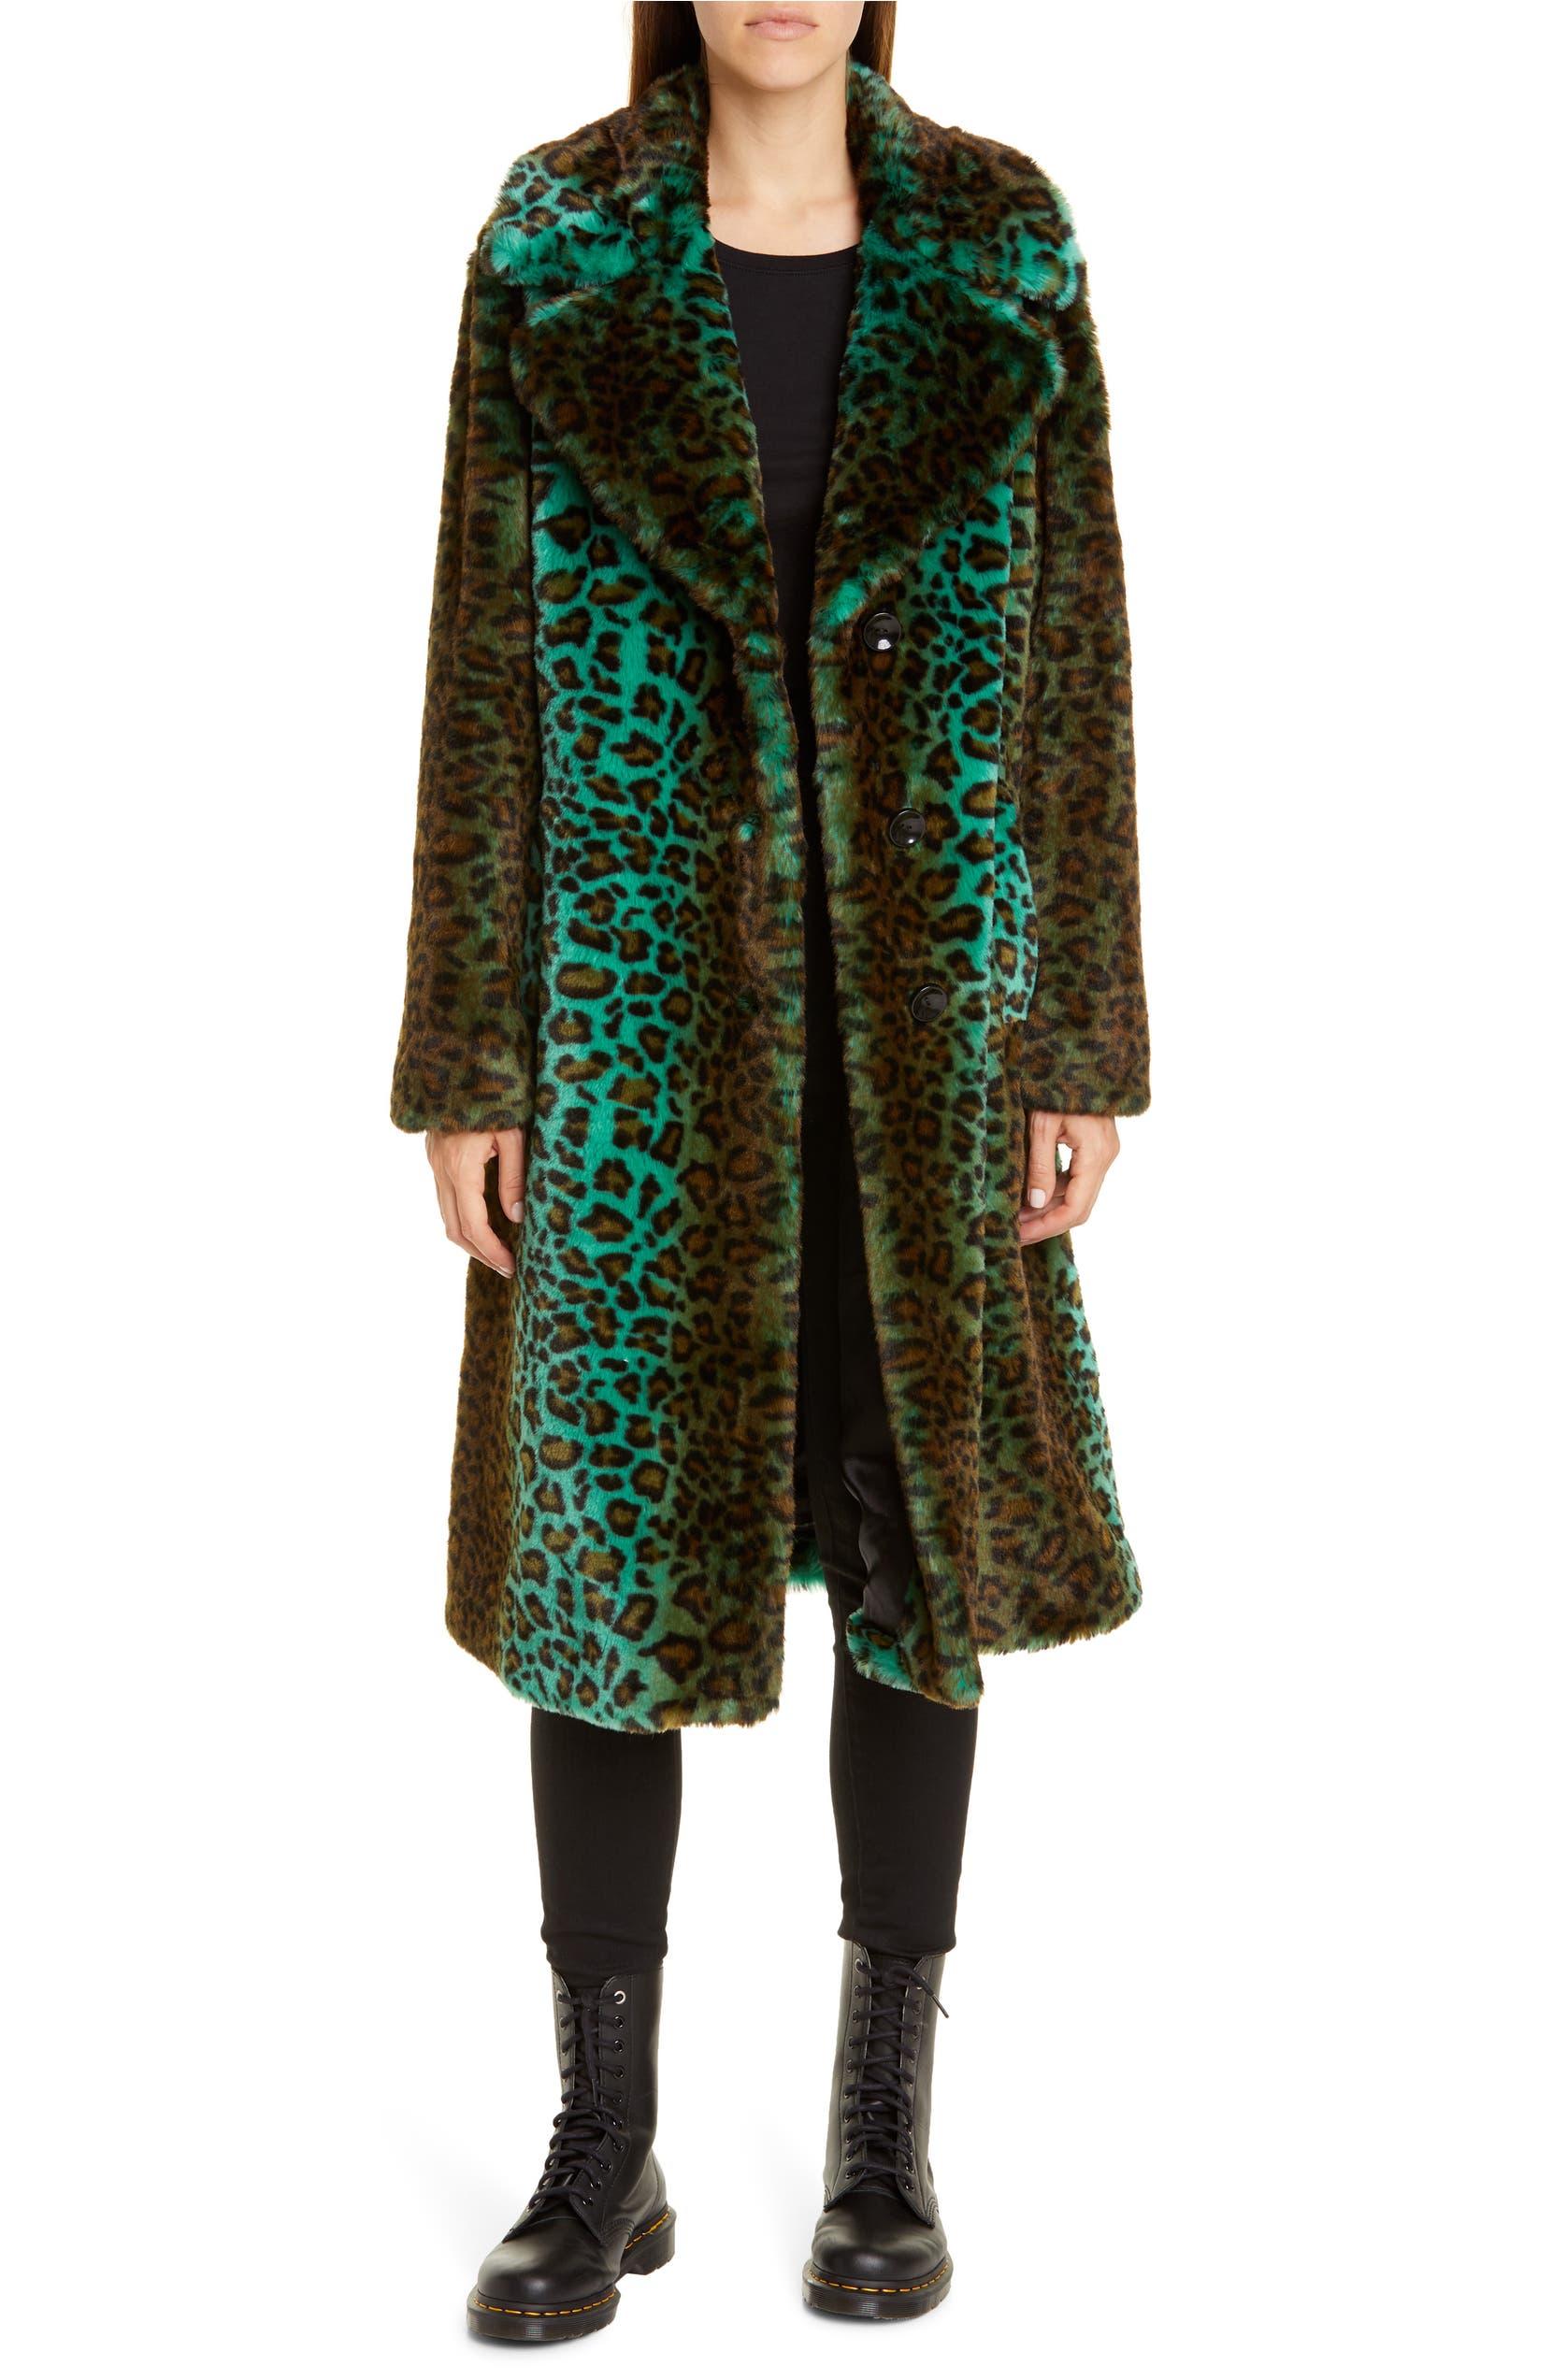 STAND STUDIO Fanny Gradient Leopard Print Faux Fur Coat, Main, color, GREEN